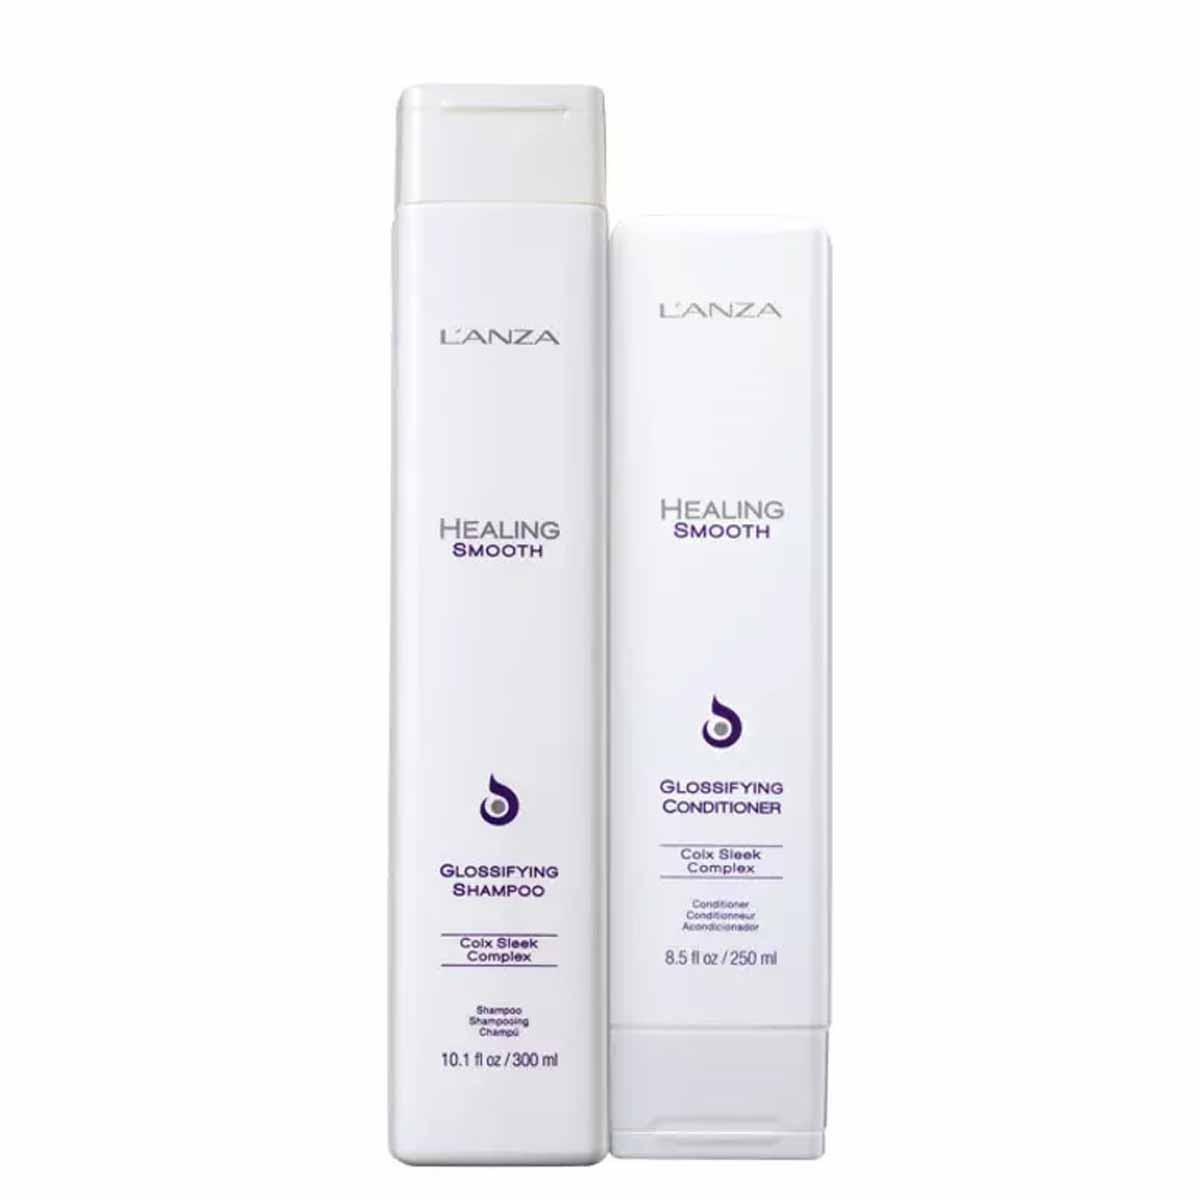 Kit Lanza Healing Smooth Glossifying Sh.300ml e Cond.250ml Anti Frizz